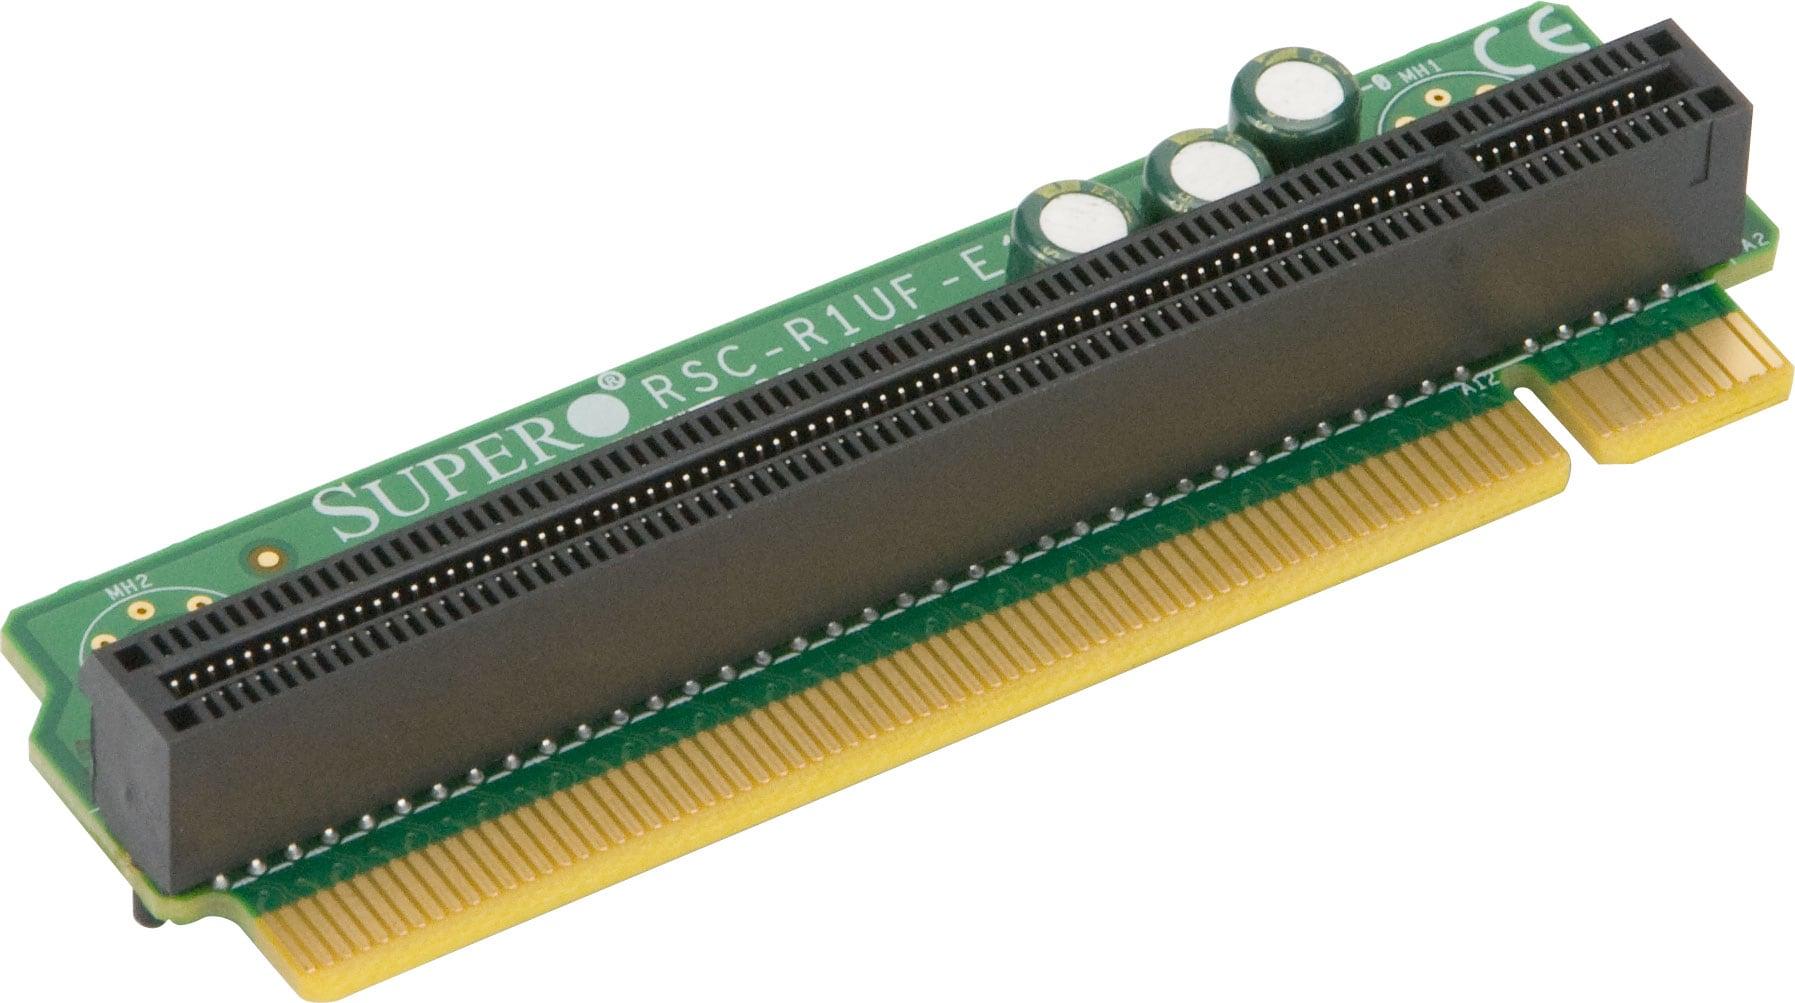 Supermicro RSC-R1UFF-E16R 1U Riser Card